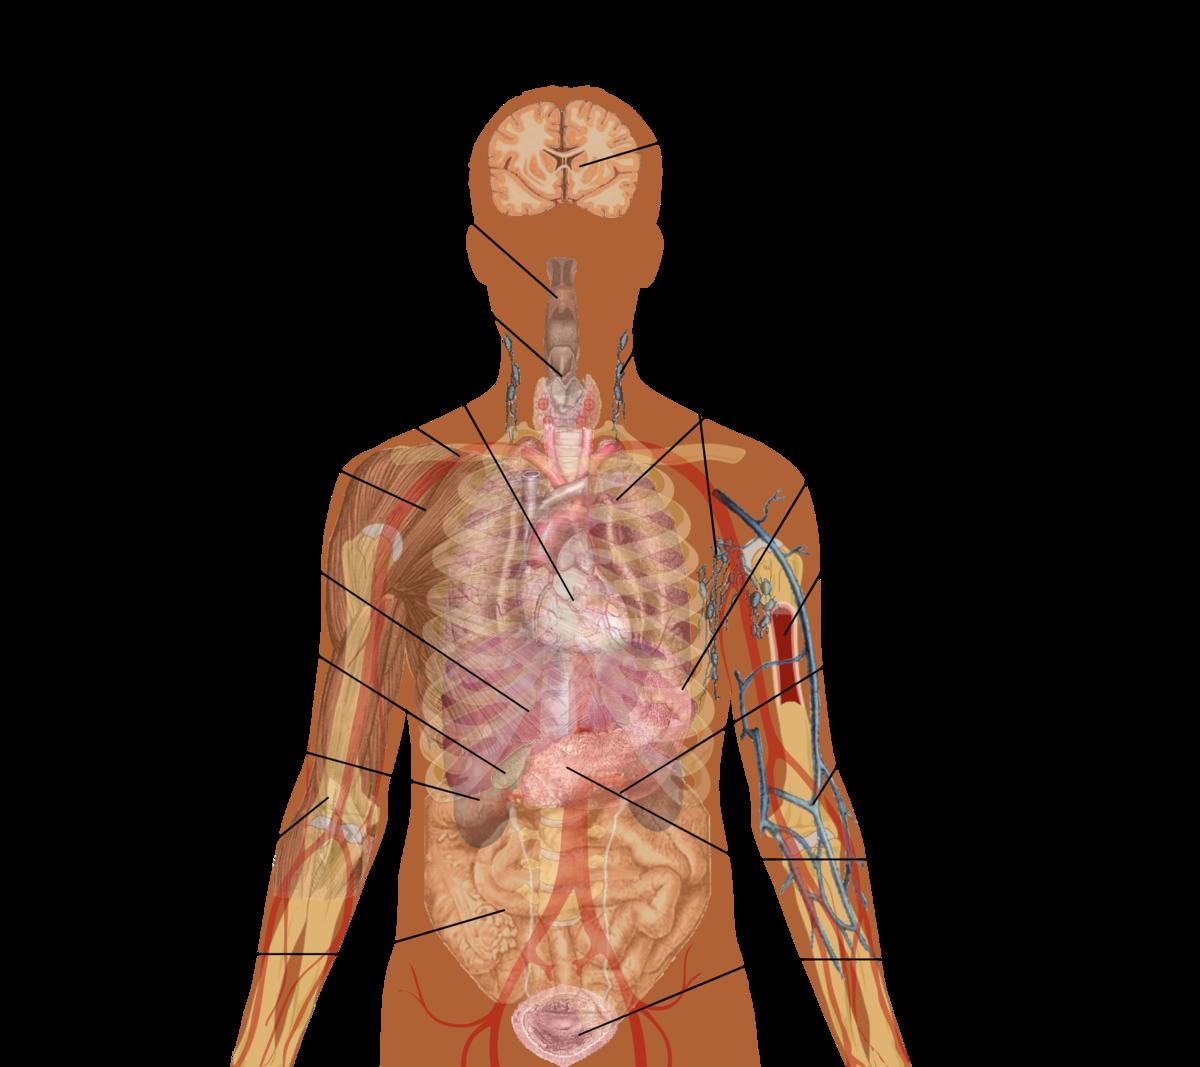 Human organs picture organ. Neck clipart body part